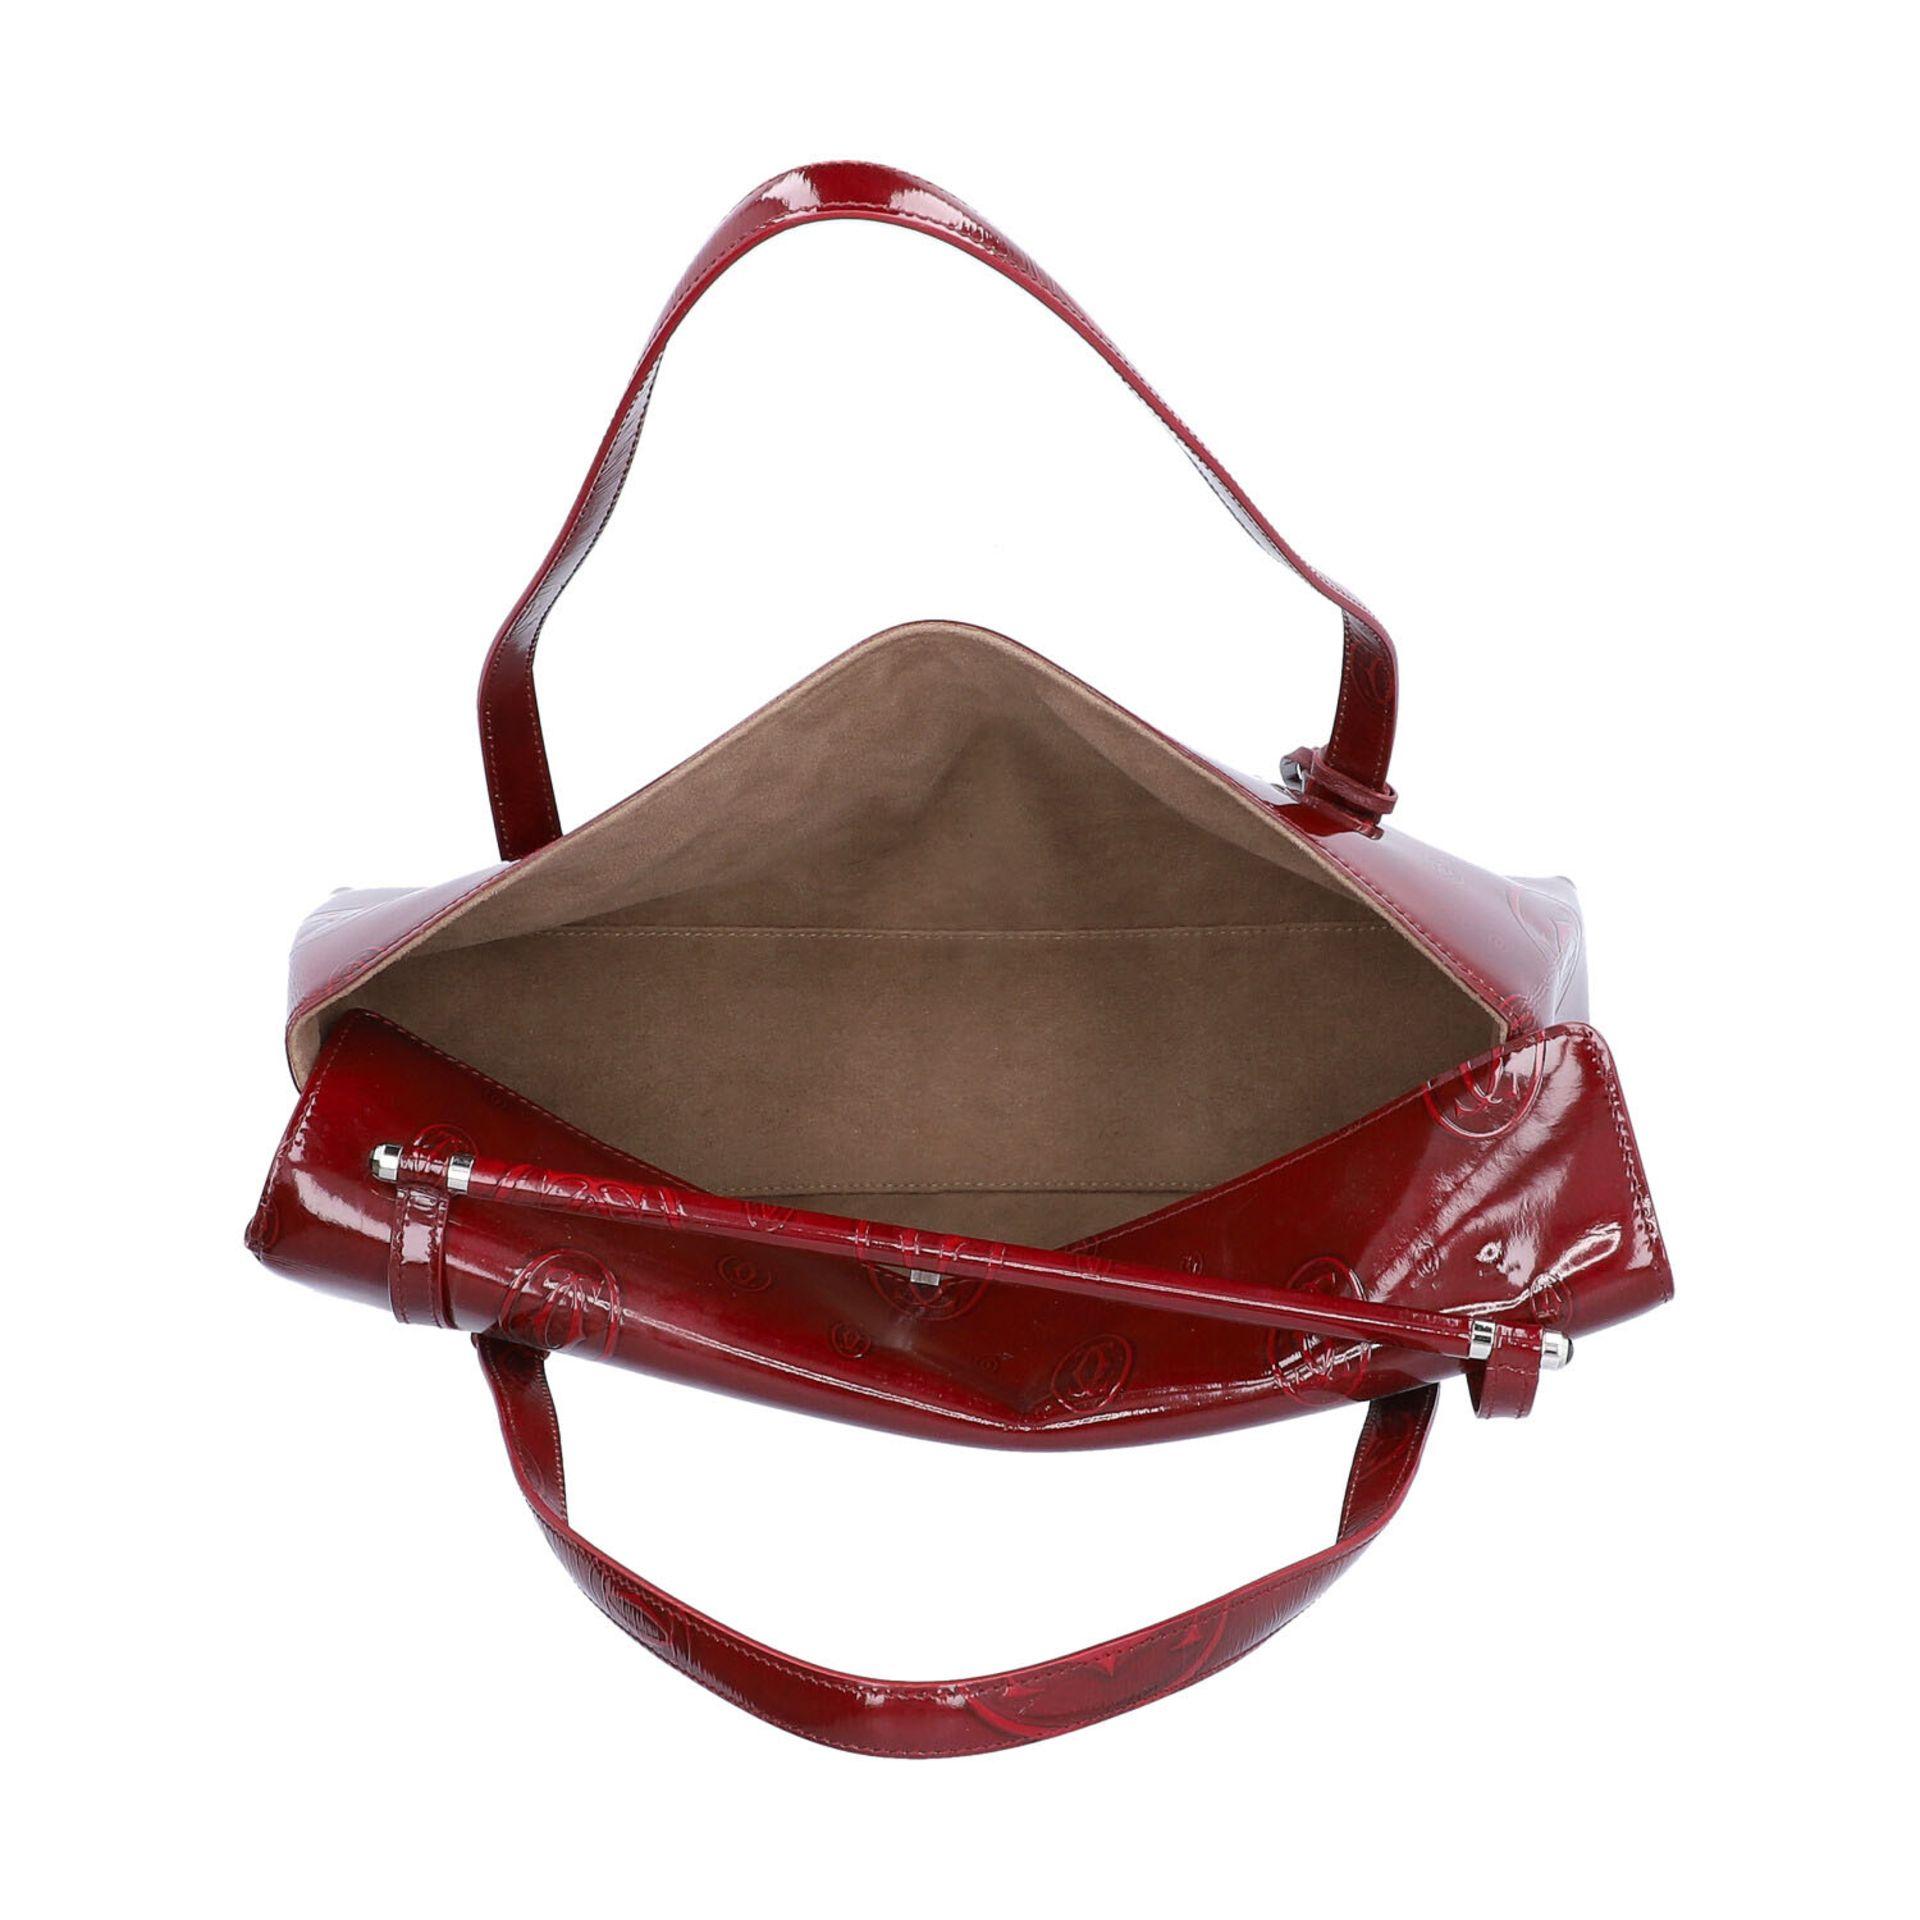 "CARTIER VINTAGE Handtasche ""HAPPY BIRTHDAY"". - Image 6 of 8"